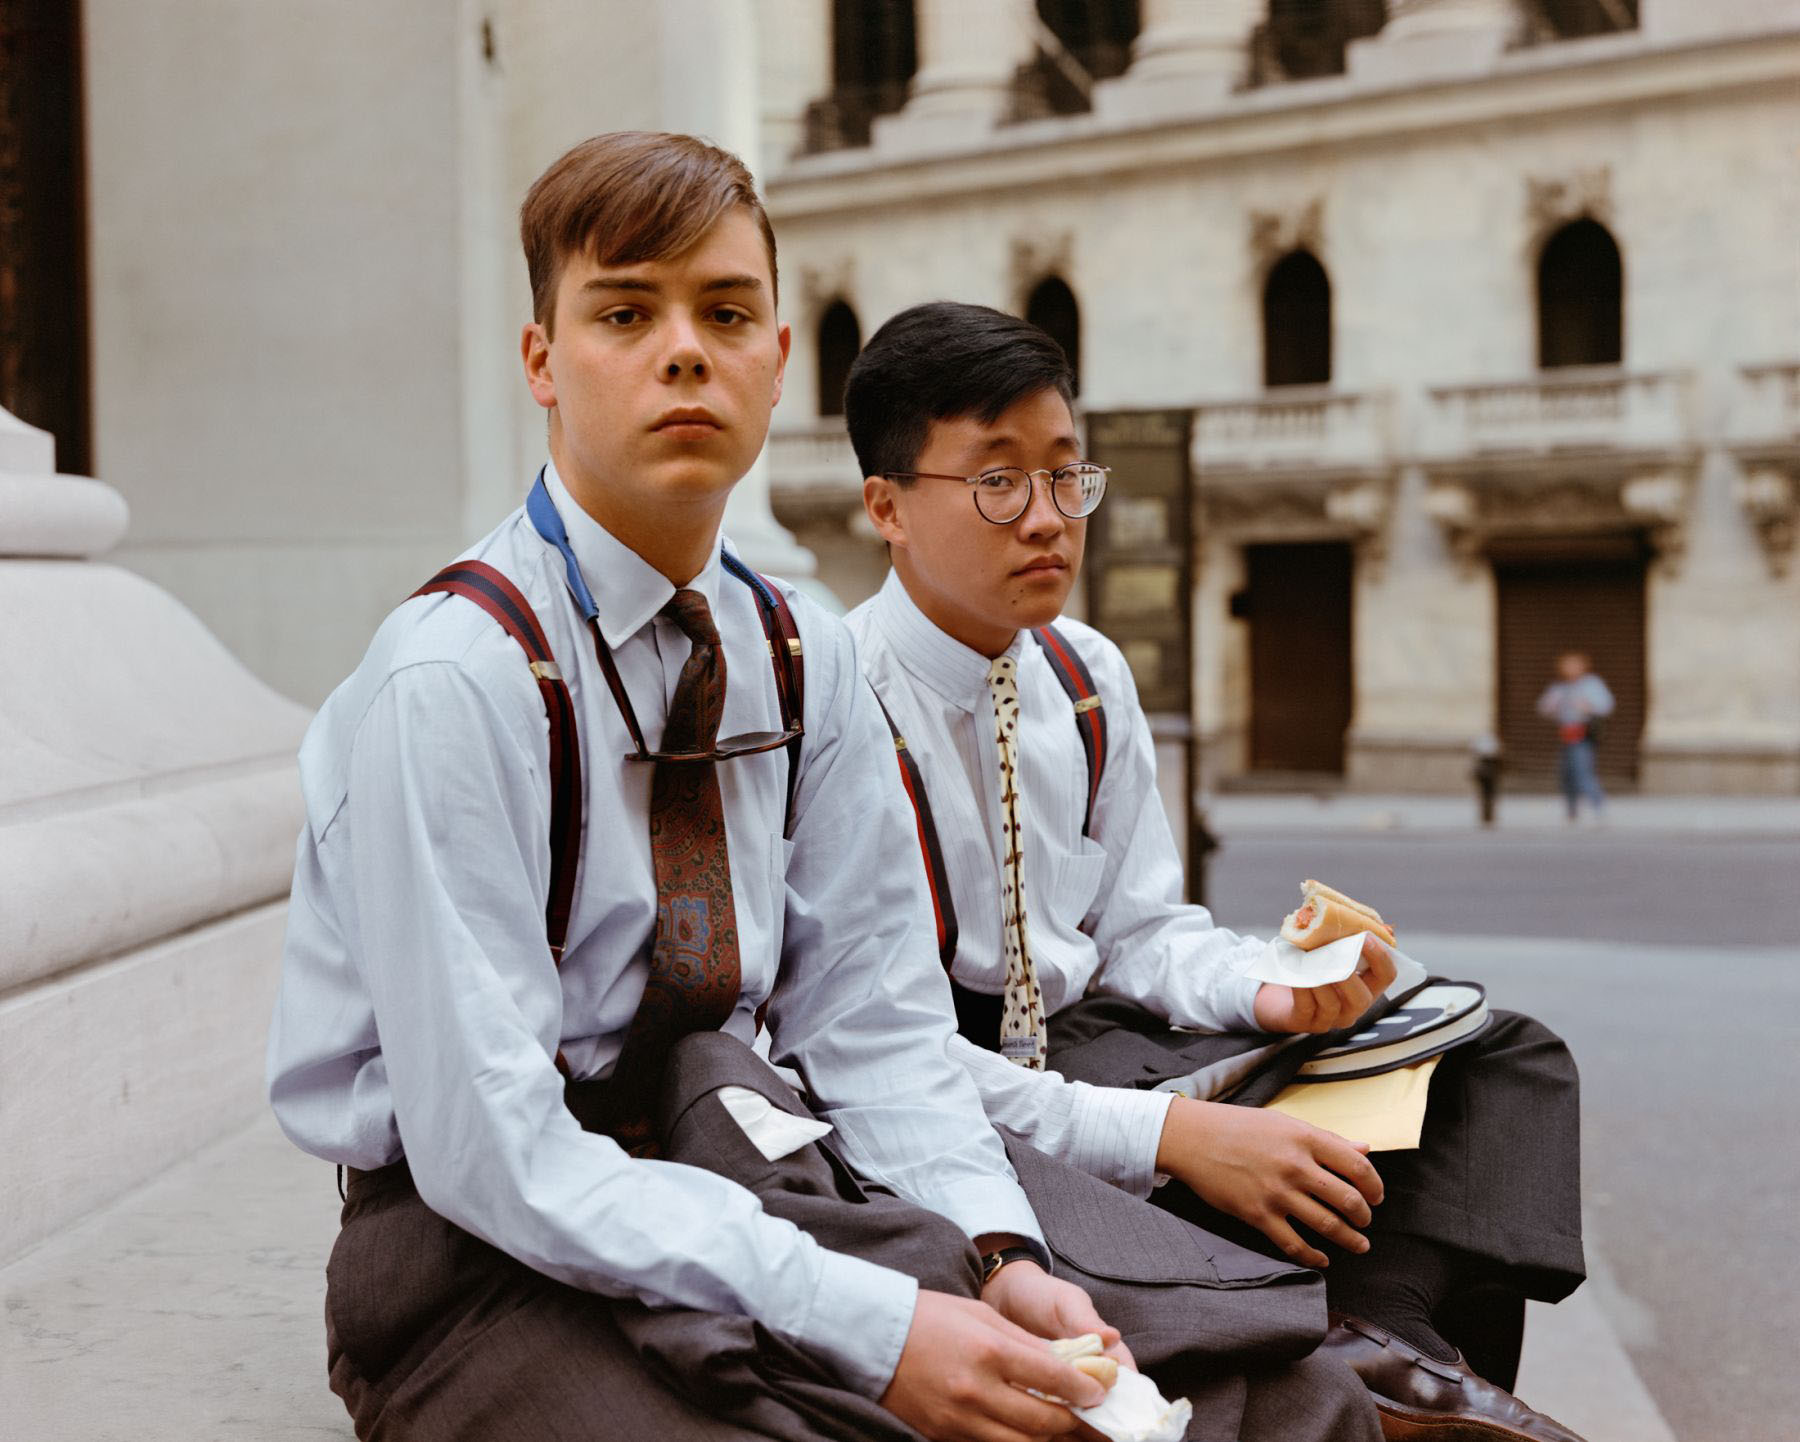 Summer Interns Having Lunch, Wall Street, New York, New York, August 1986